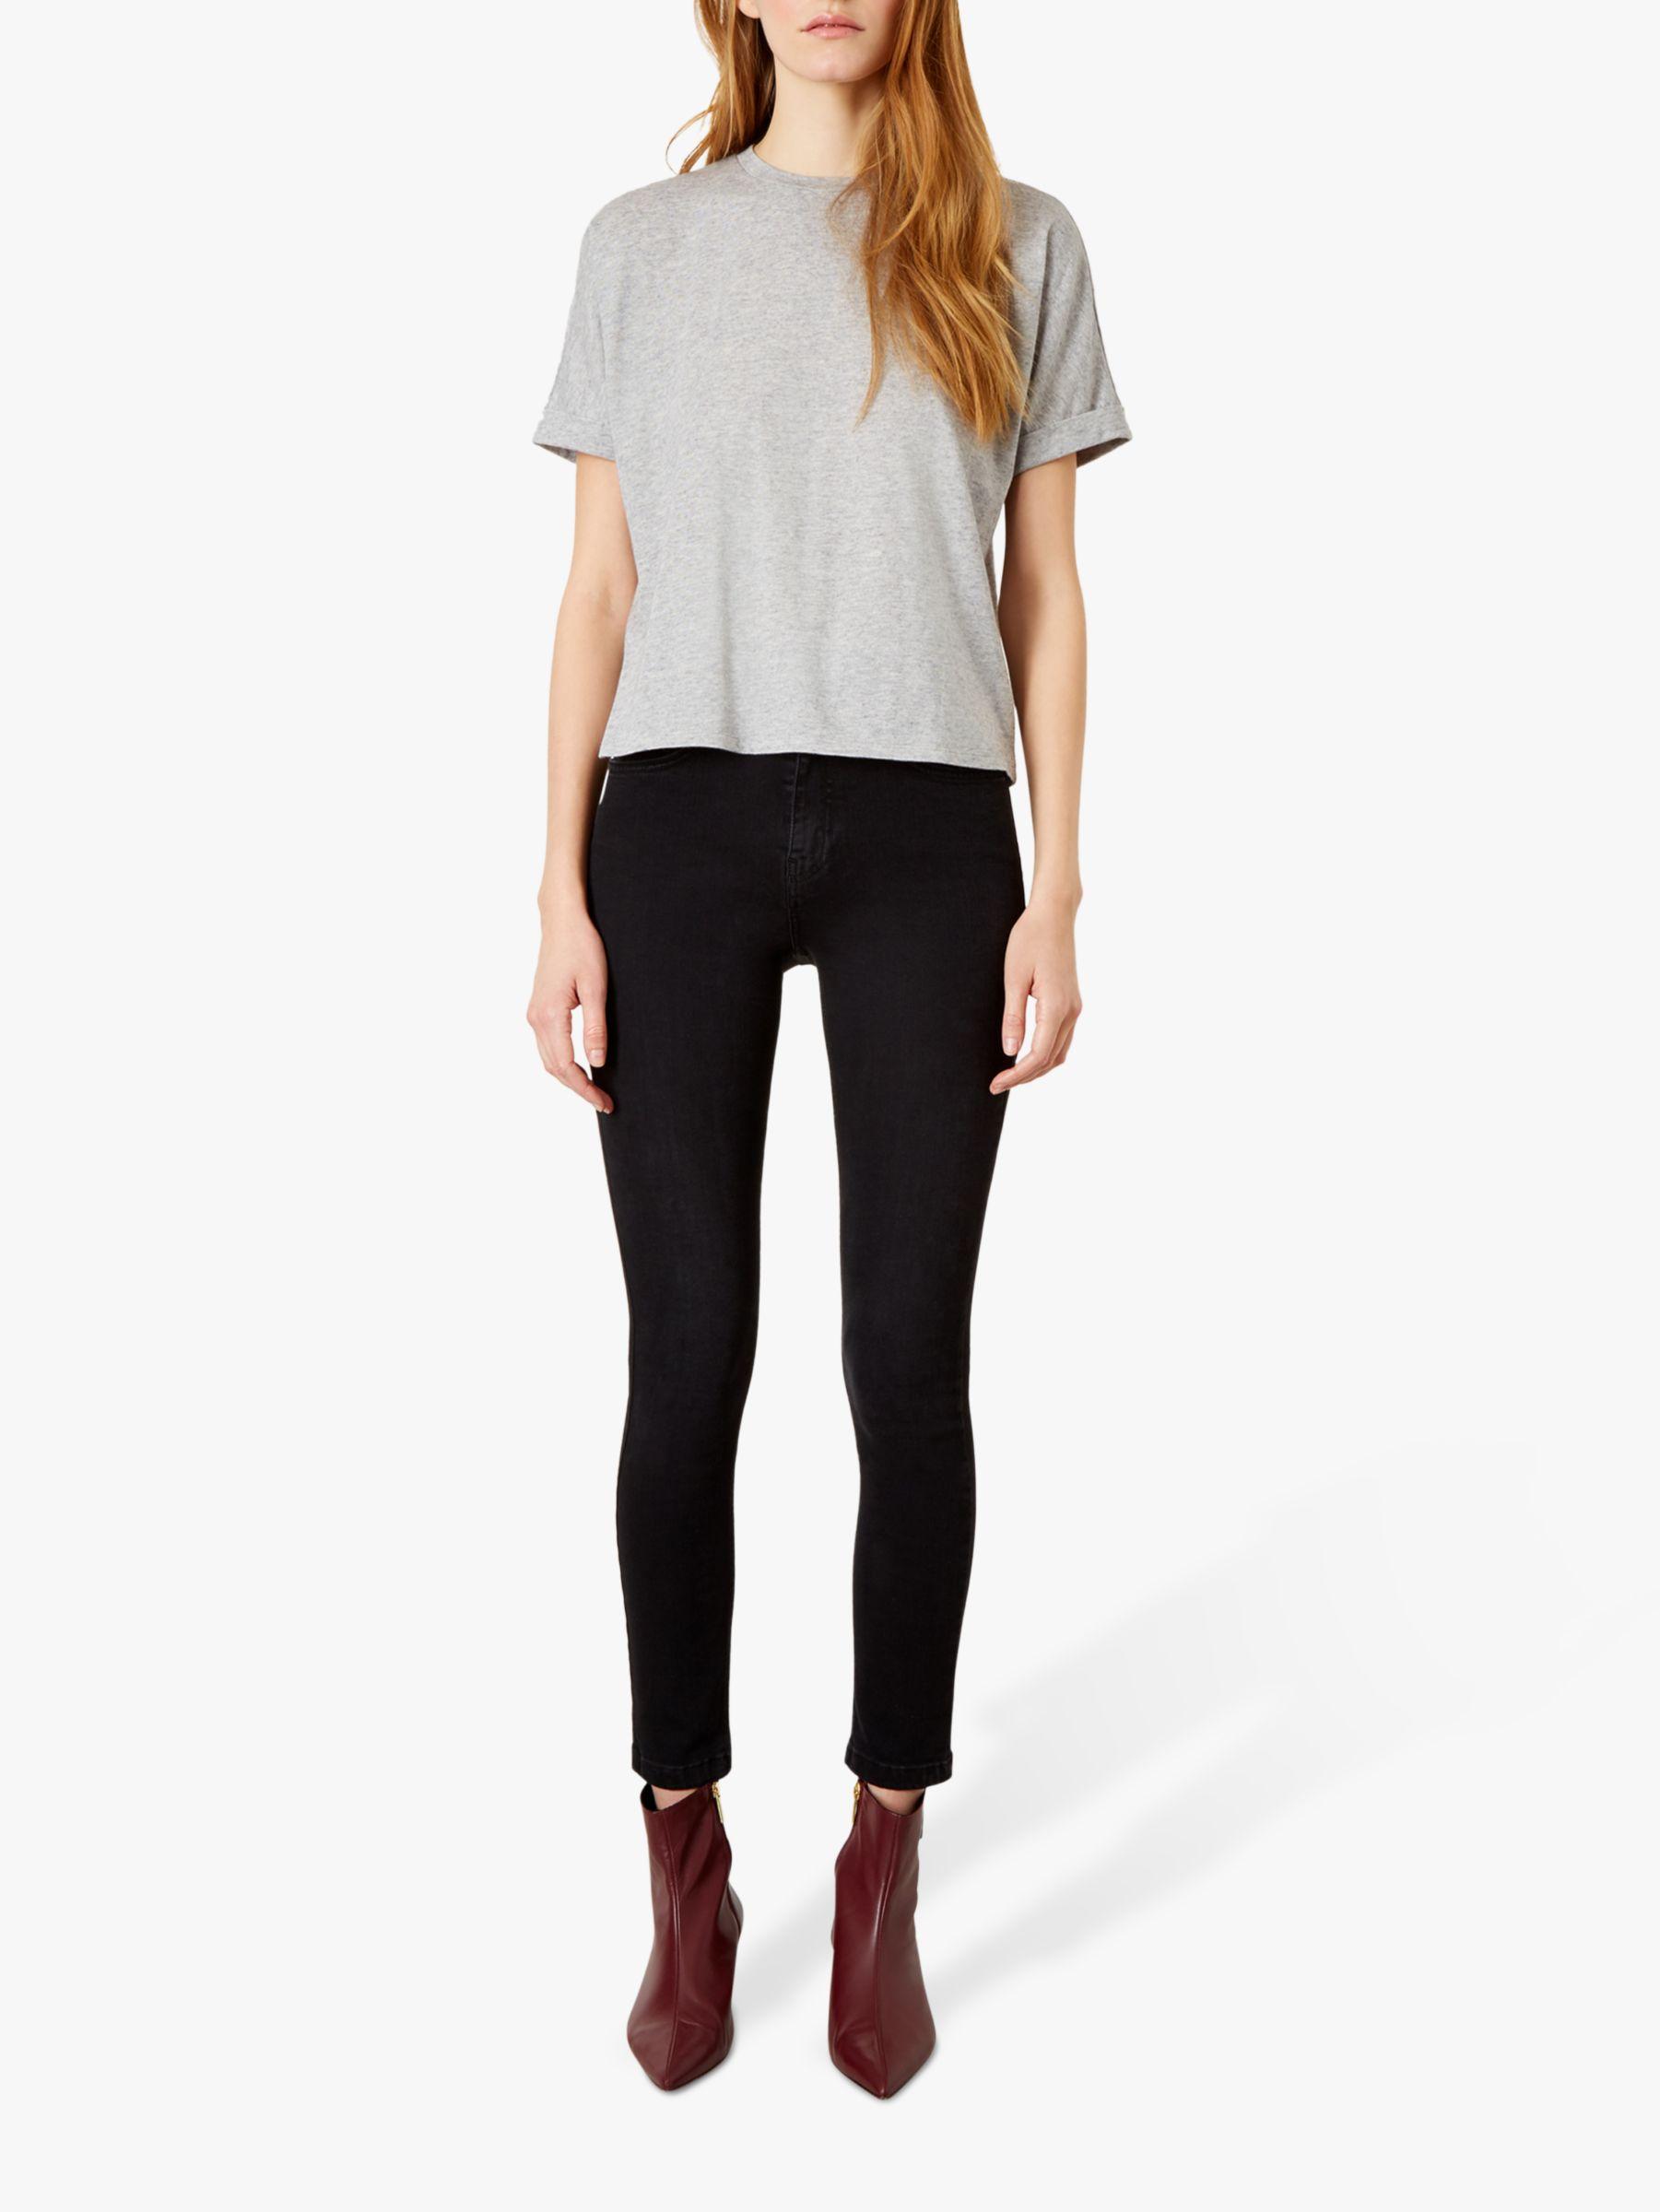 hight resolution of buyiden the emmeline cotton cashmere blend t shirt heather grey xs online at